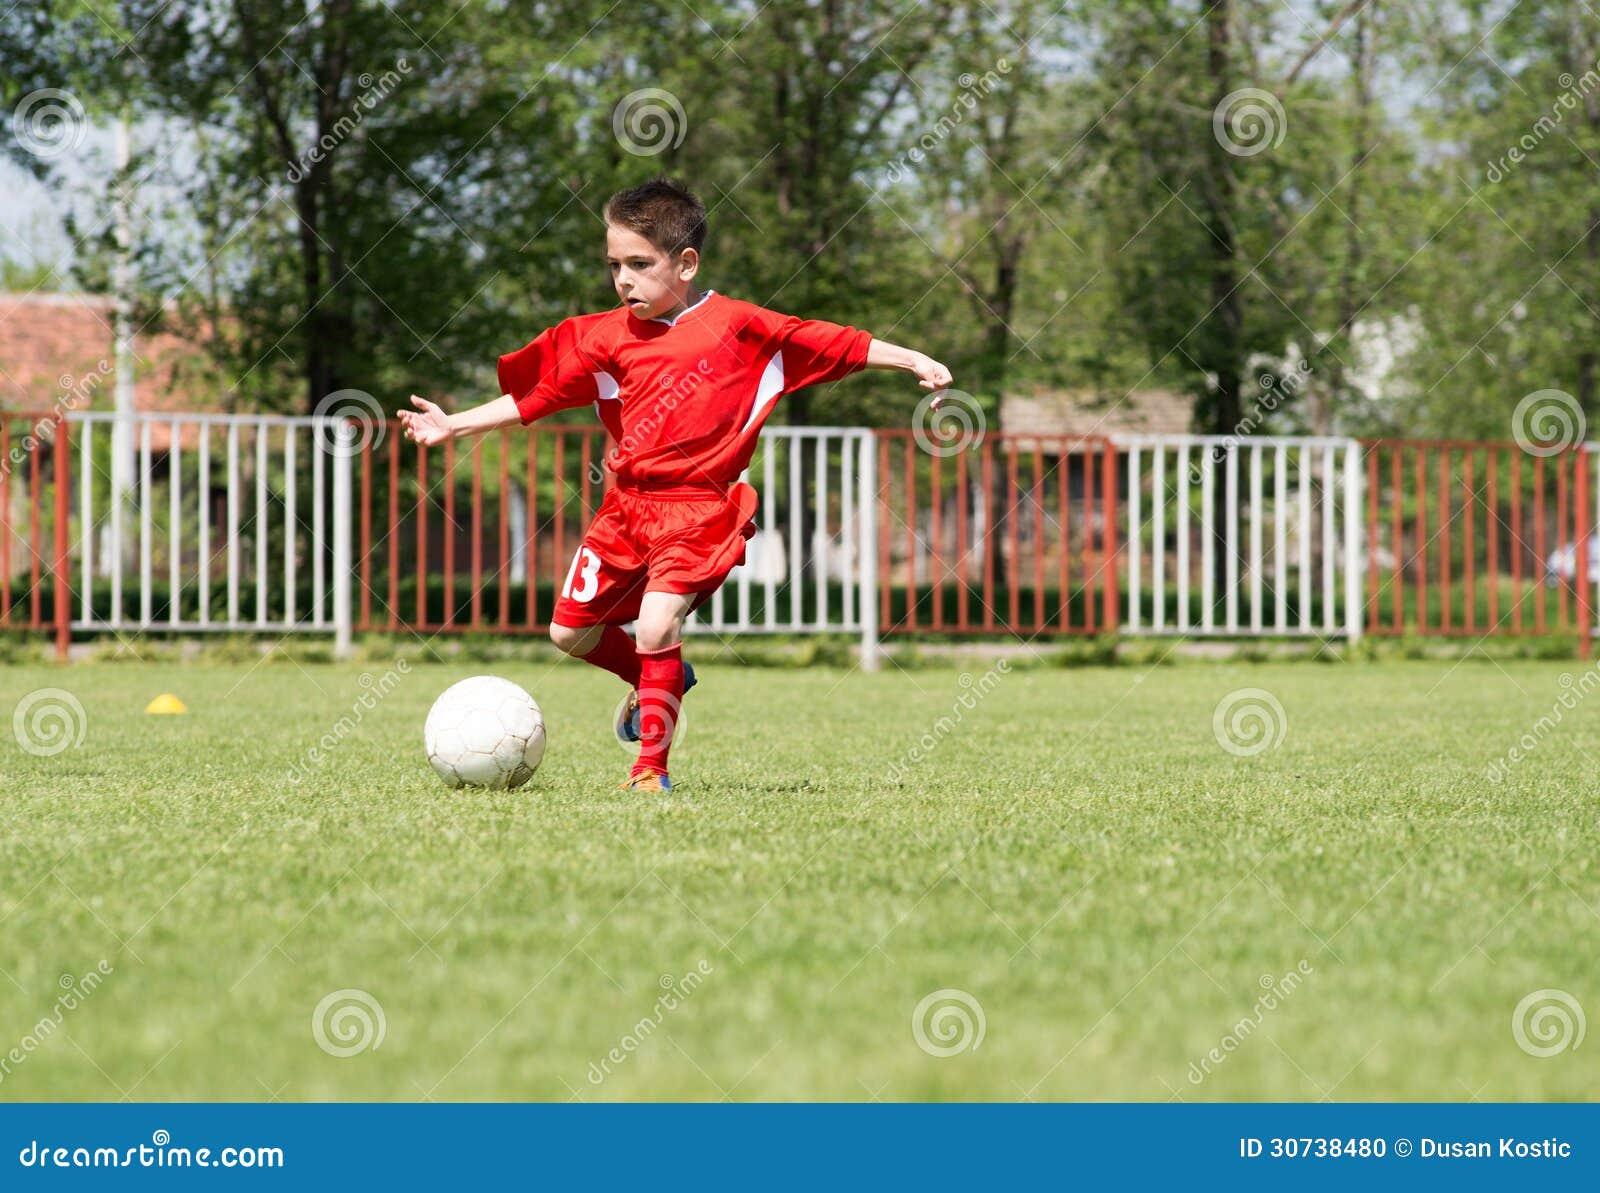 Little Boys Playing Soccer